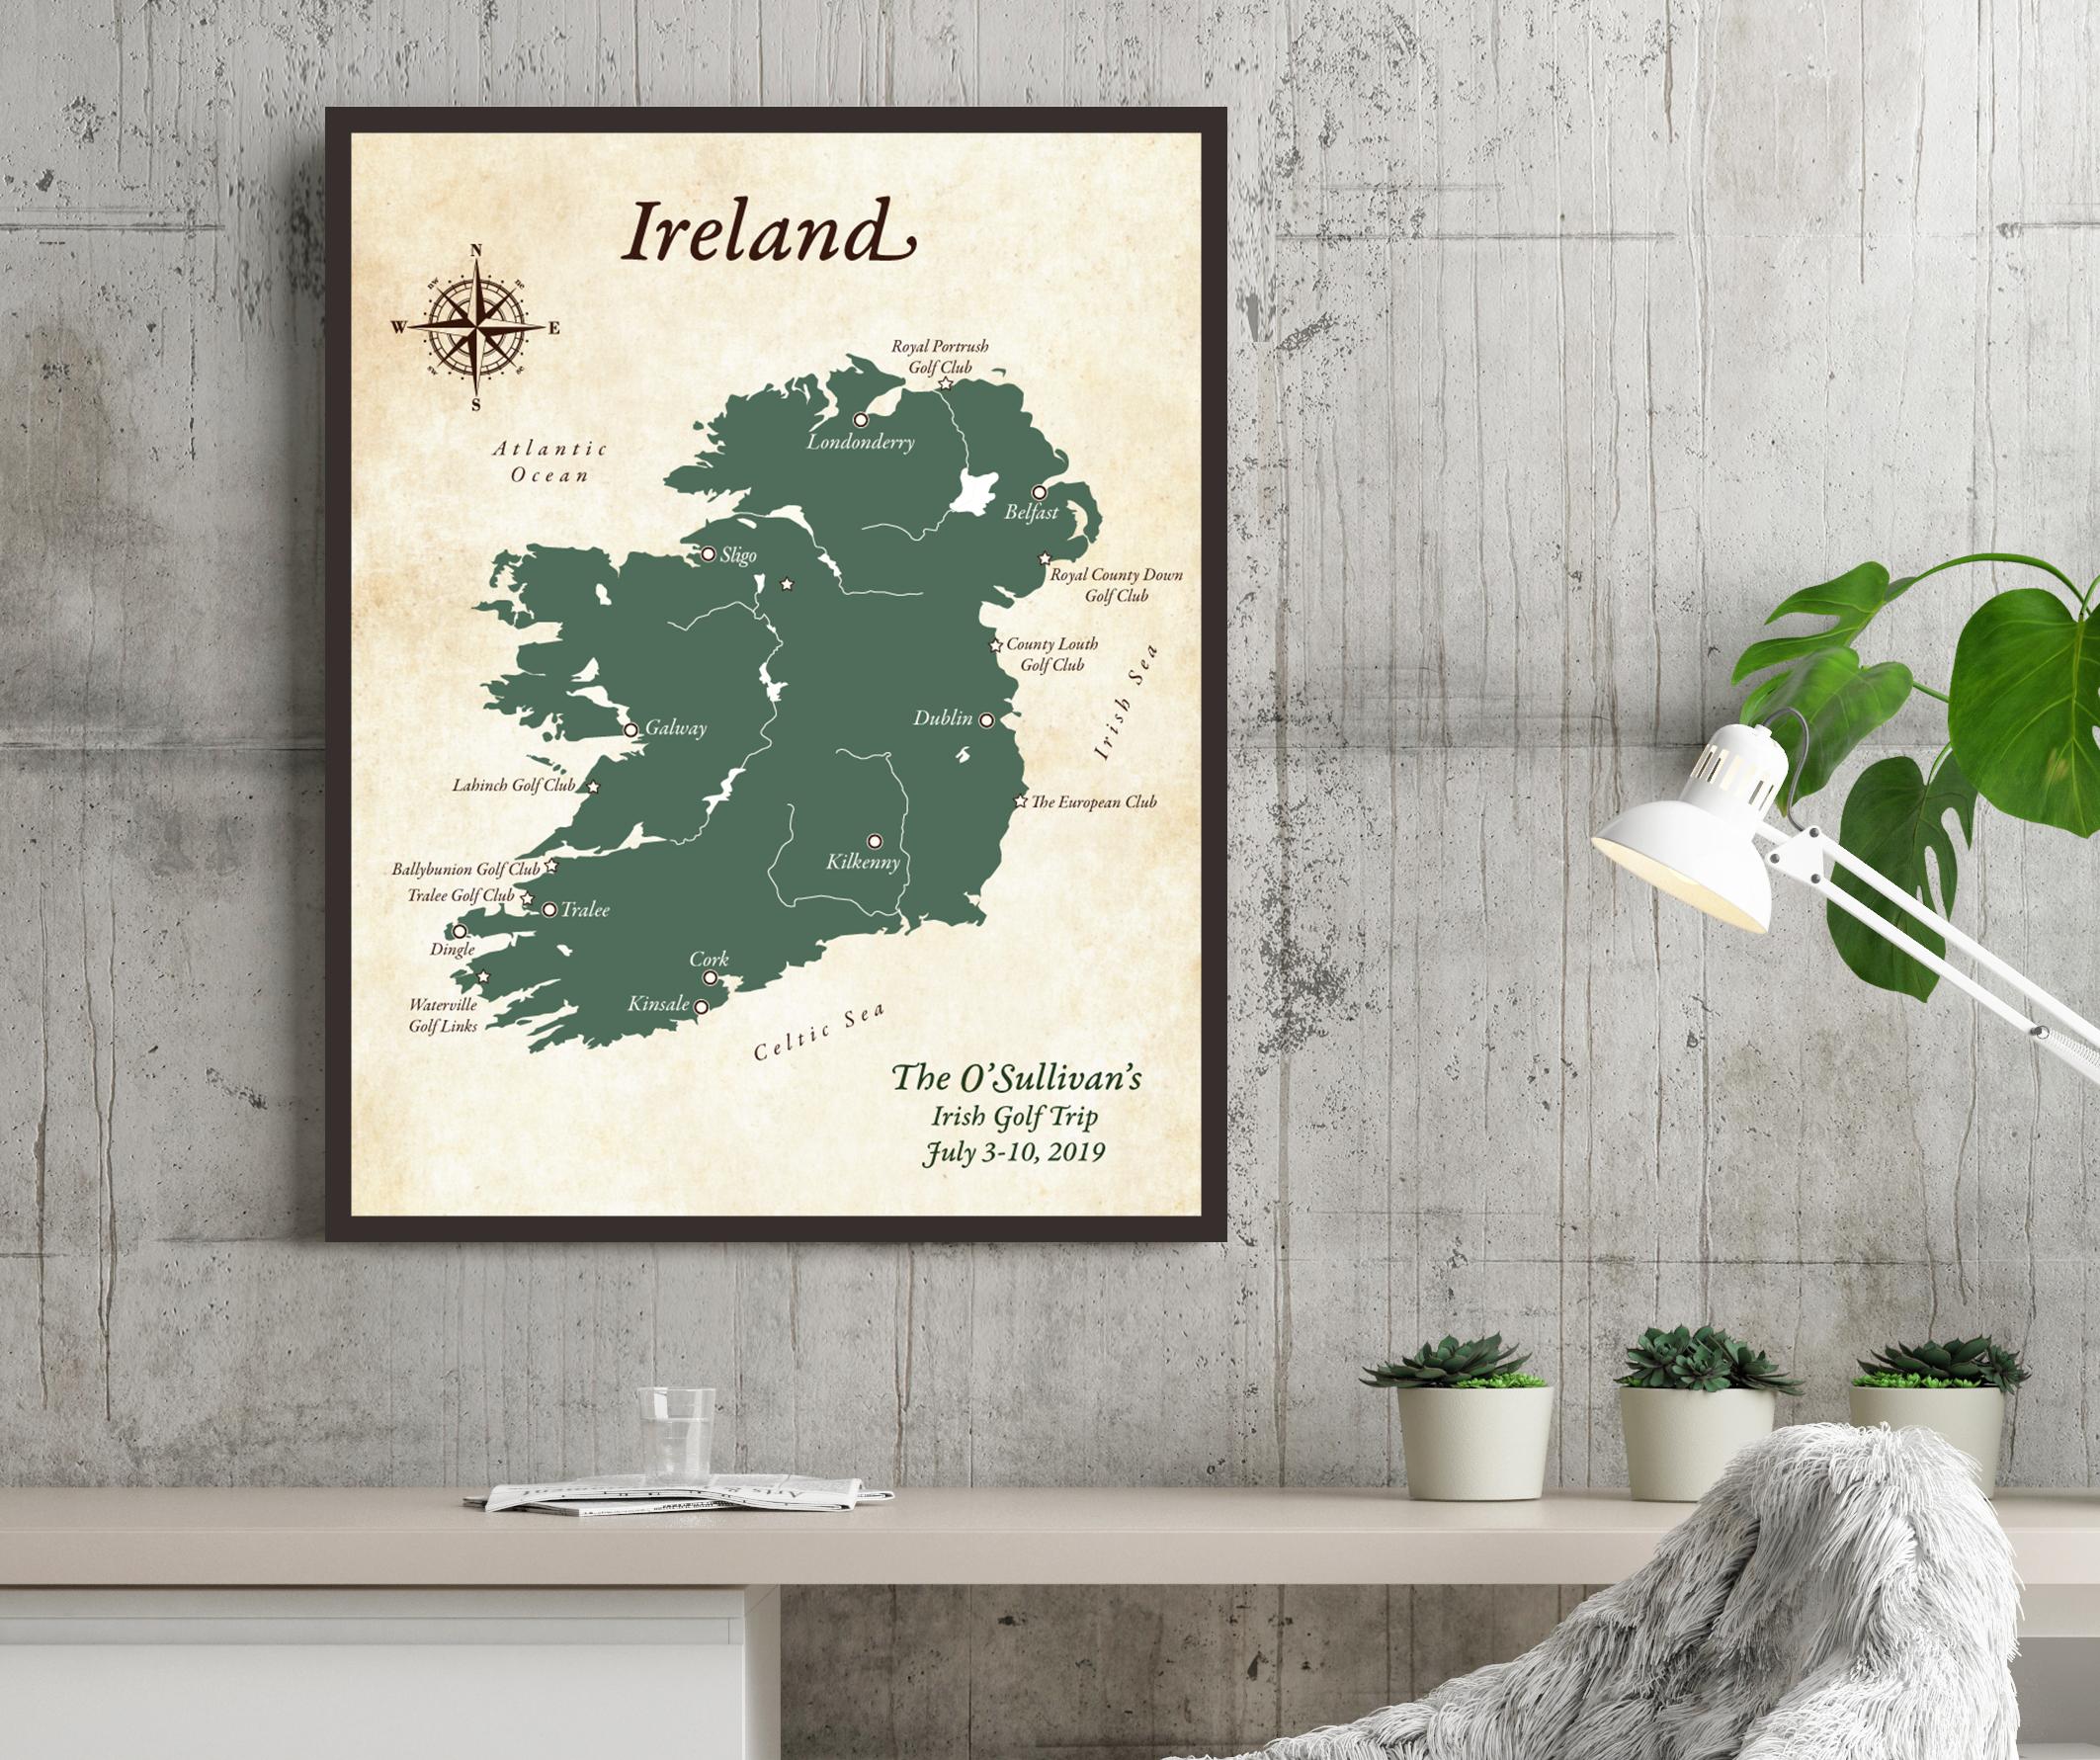 ireland map golfing trip